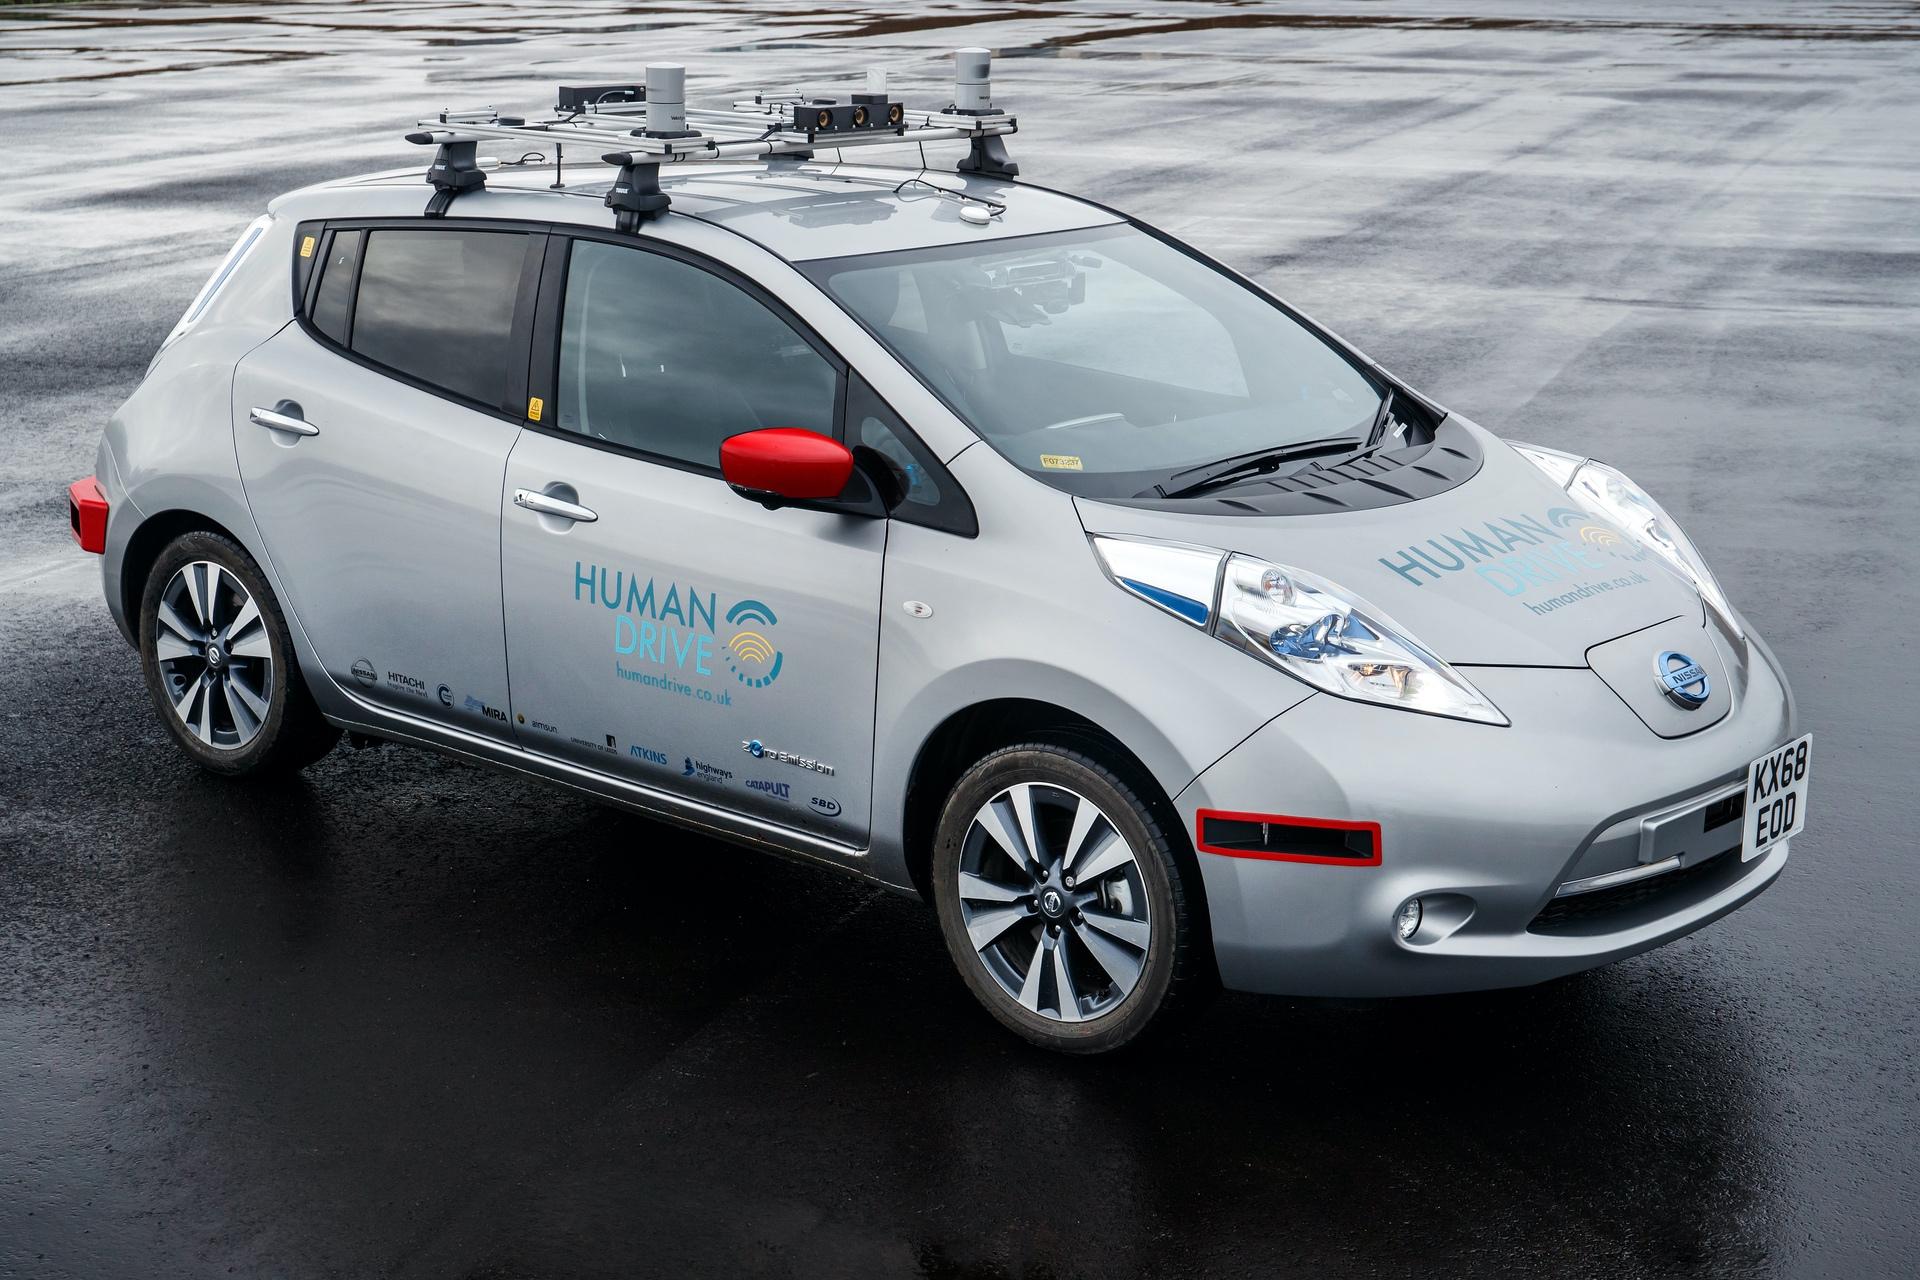 Nissan_Leaf_HumanDrive_0029